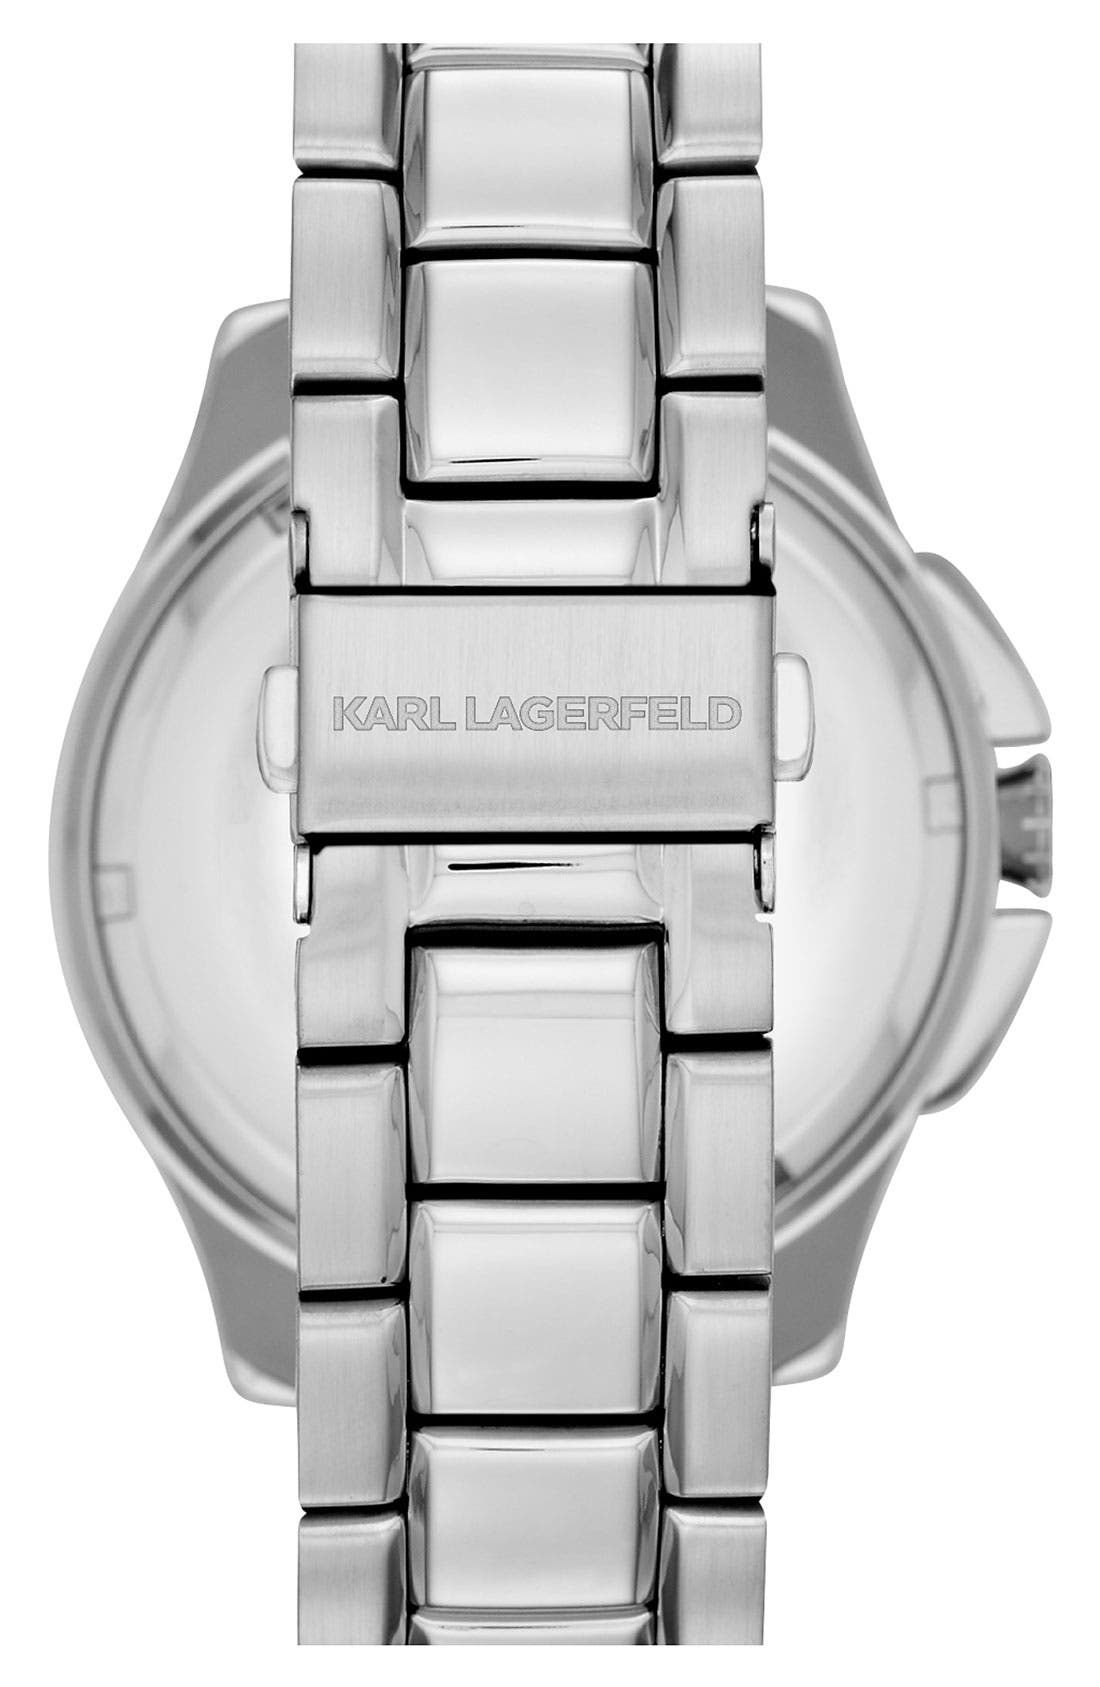 Alternate Image 2  - KARL LAGERFELD '7' Faceted Bezel Bracelet Watch, 44mm x 53mm